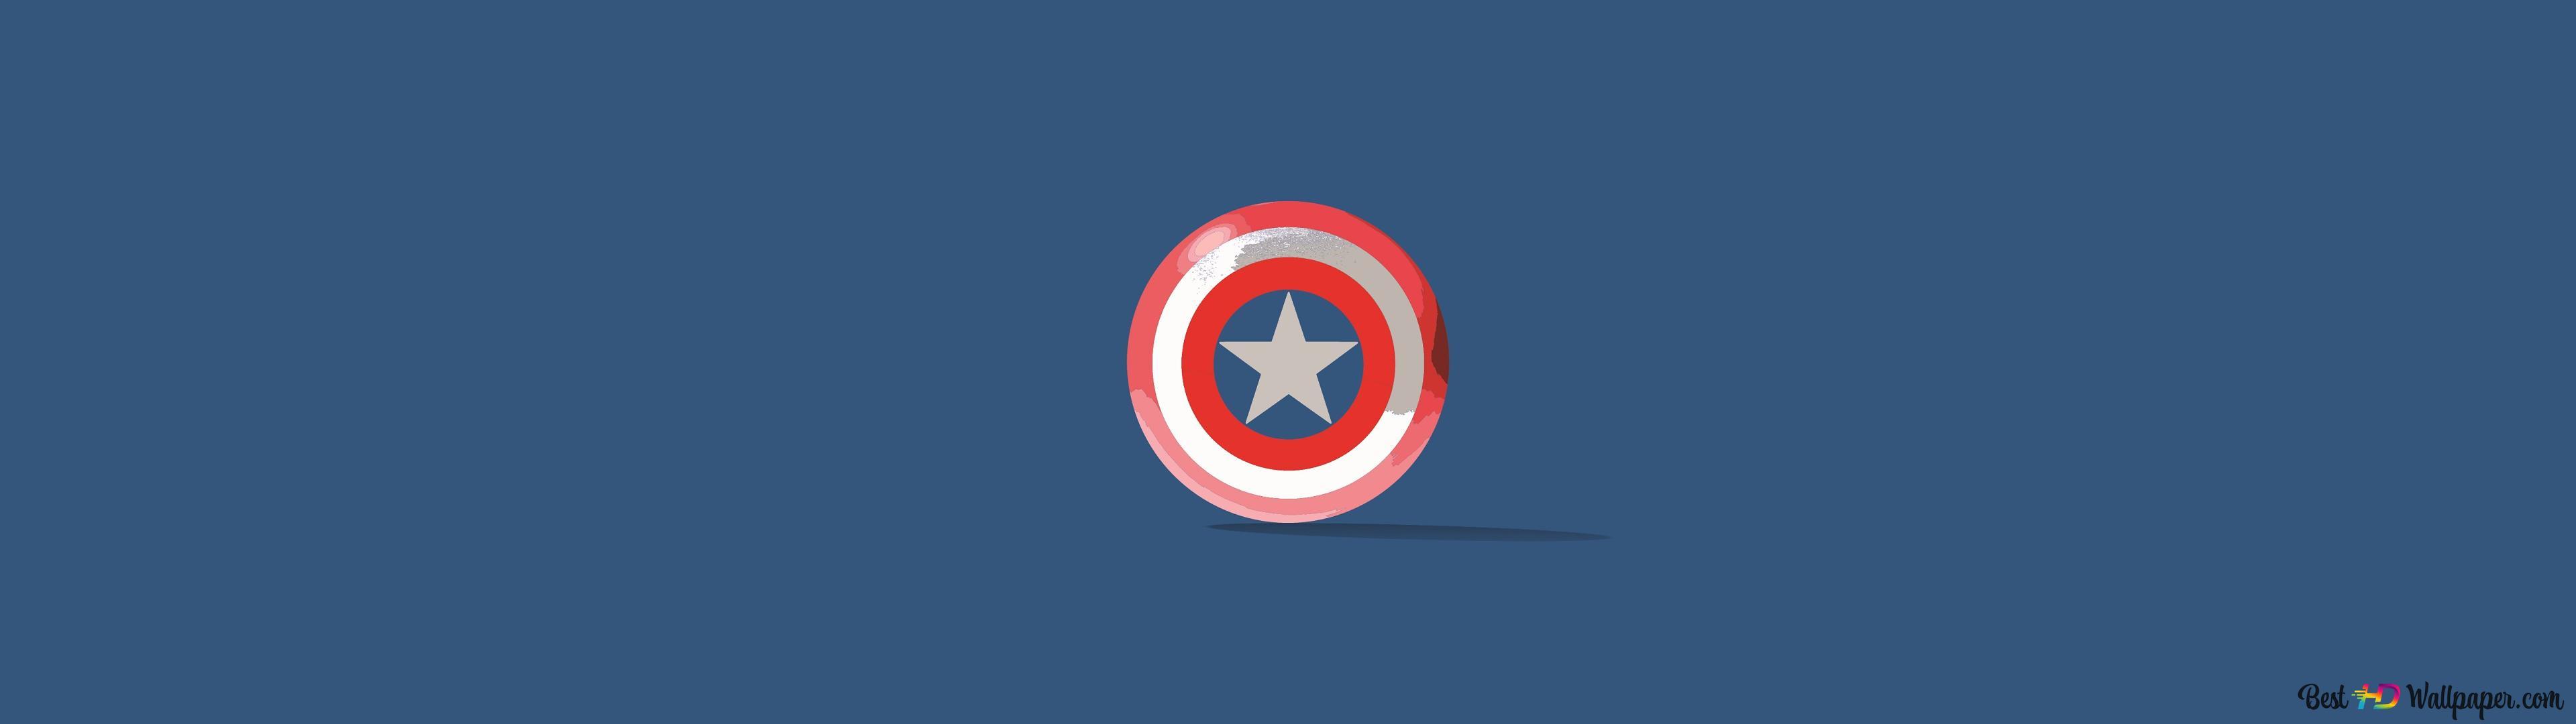 Poder Escudo Do Capitao America Hd Wallpaper Download